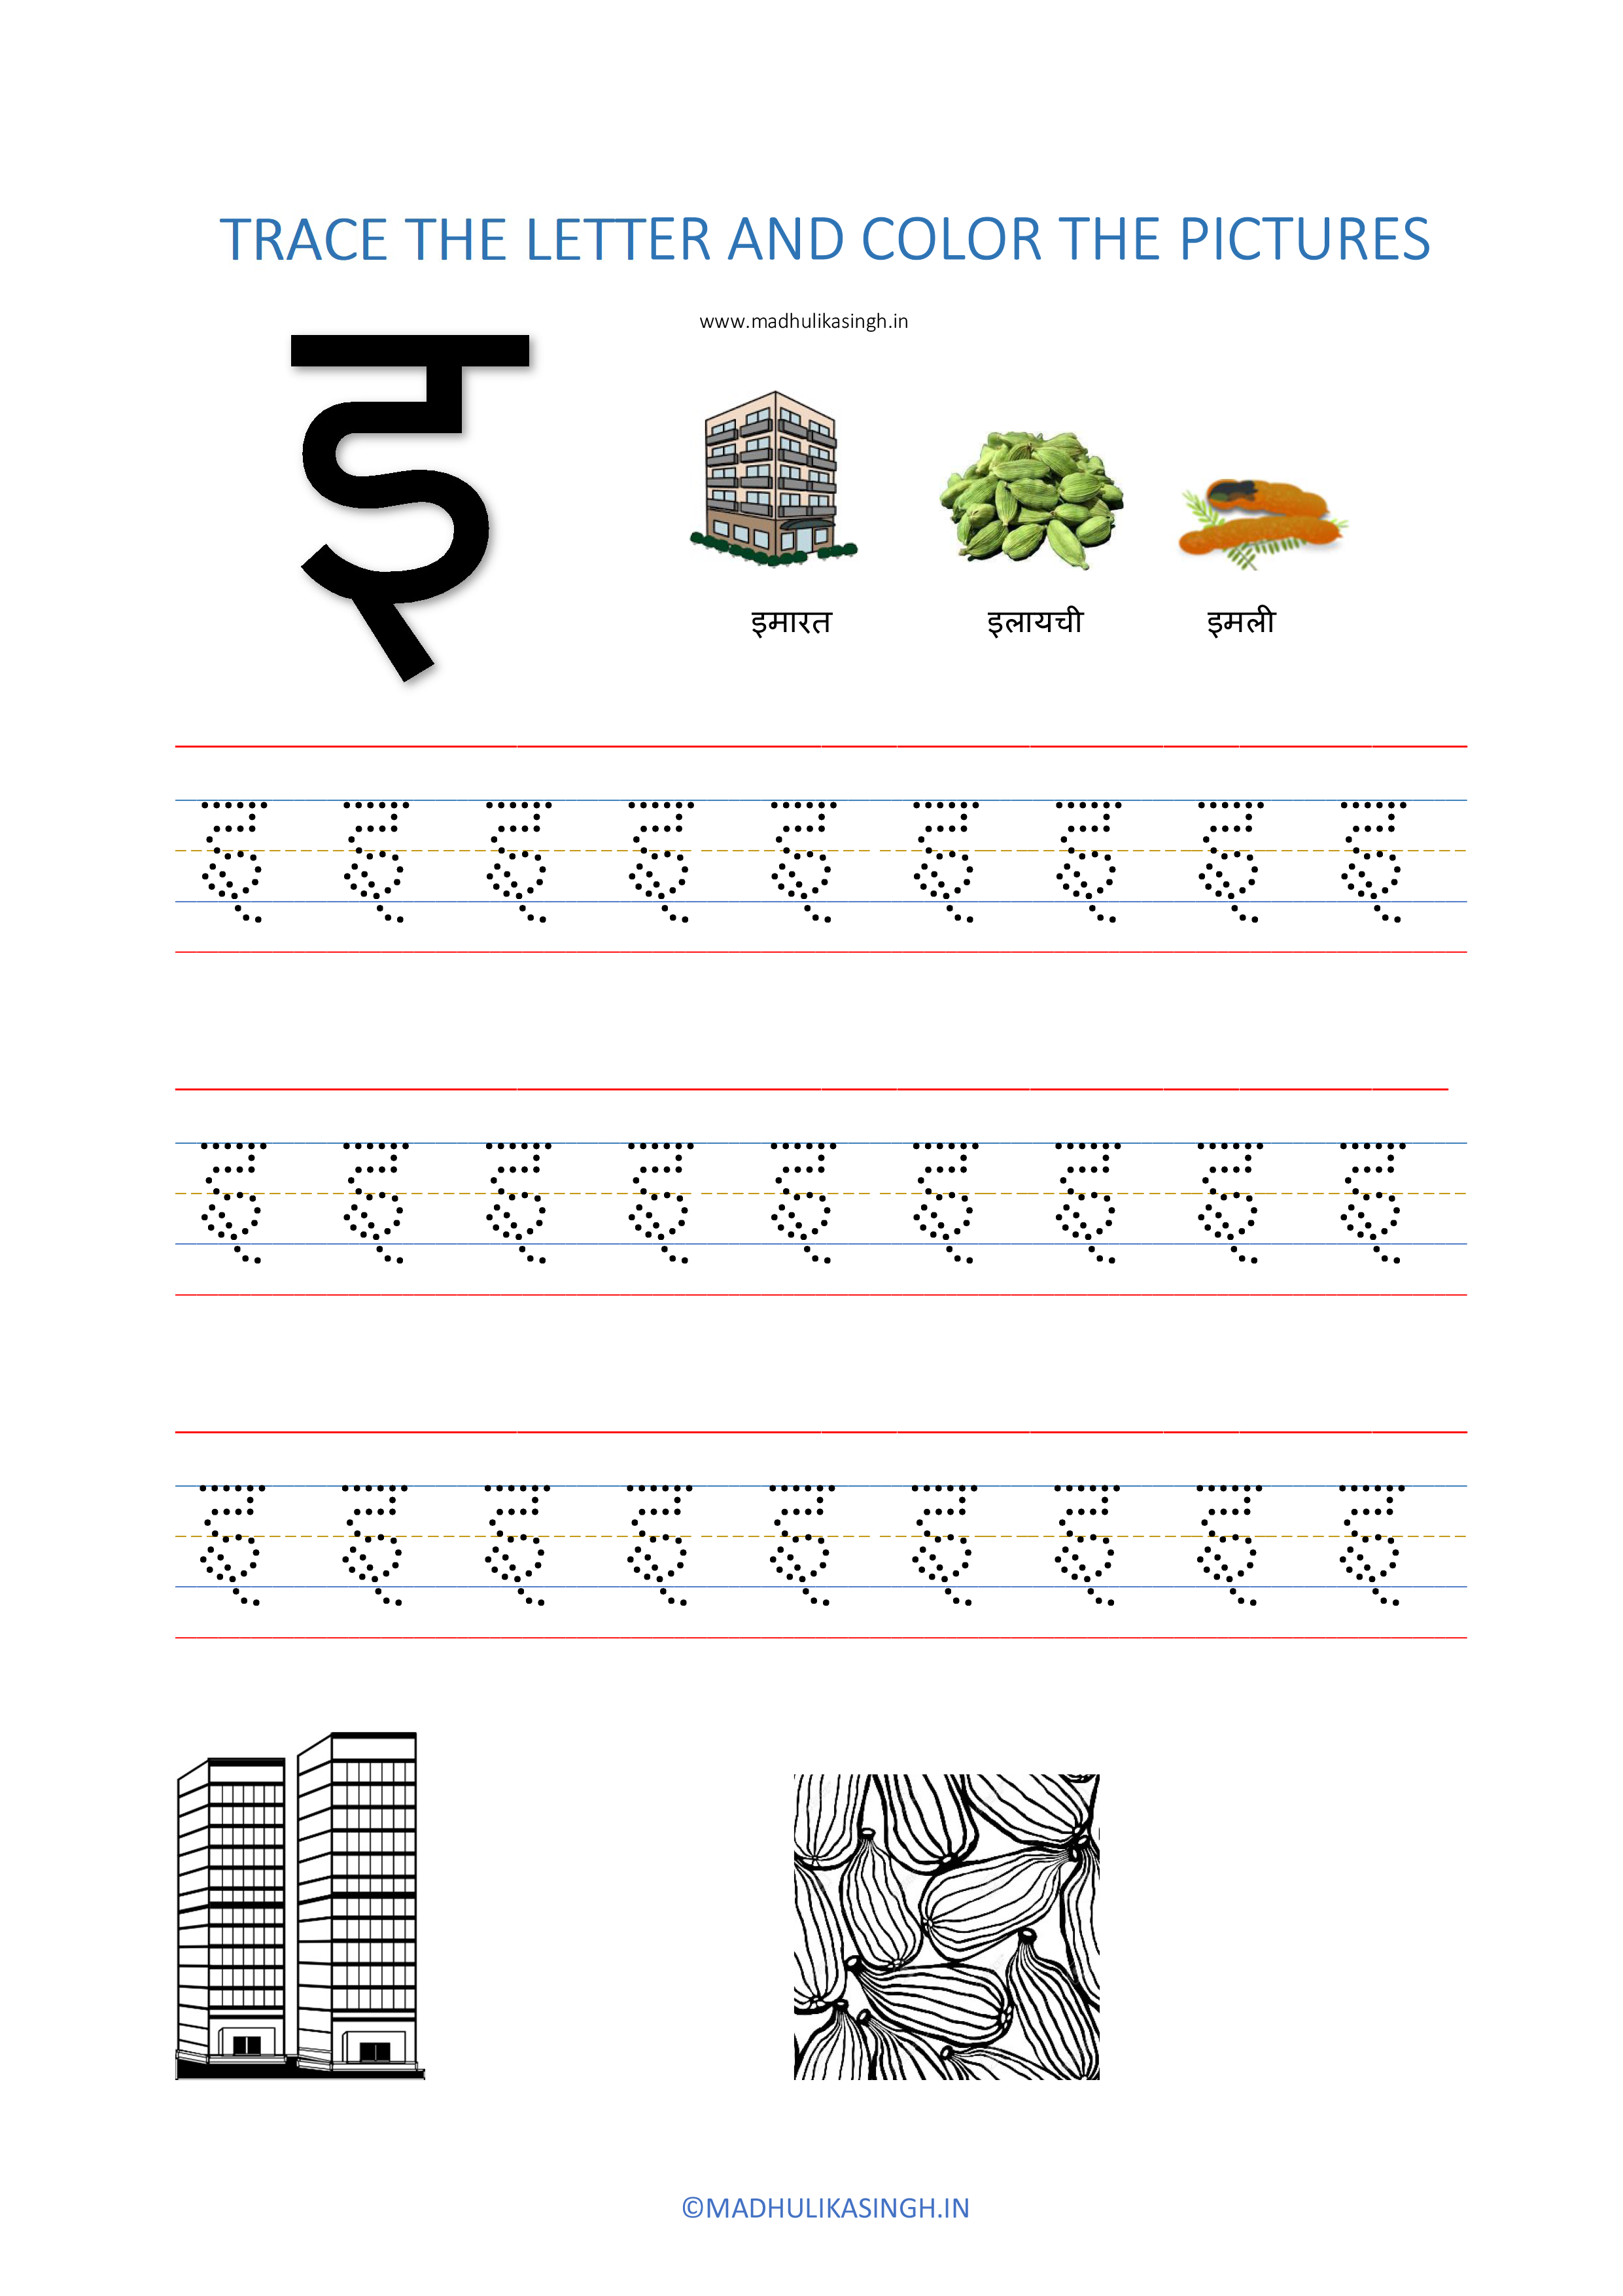 Hindi Alphabet Tracing Worksheets Printable Pdf À¤… To À¤œ À¤ž 56 Pages Free Preschool - 28+ Hindi Swar Worksheets For Kindergarten Pdf Images